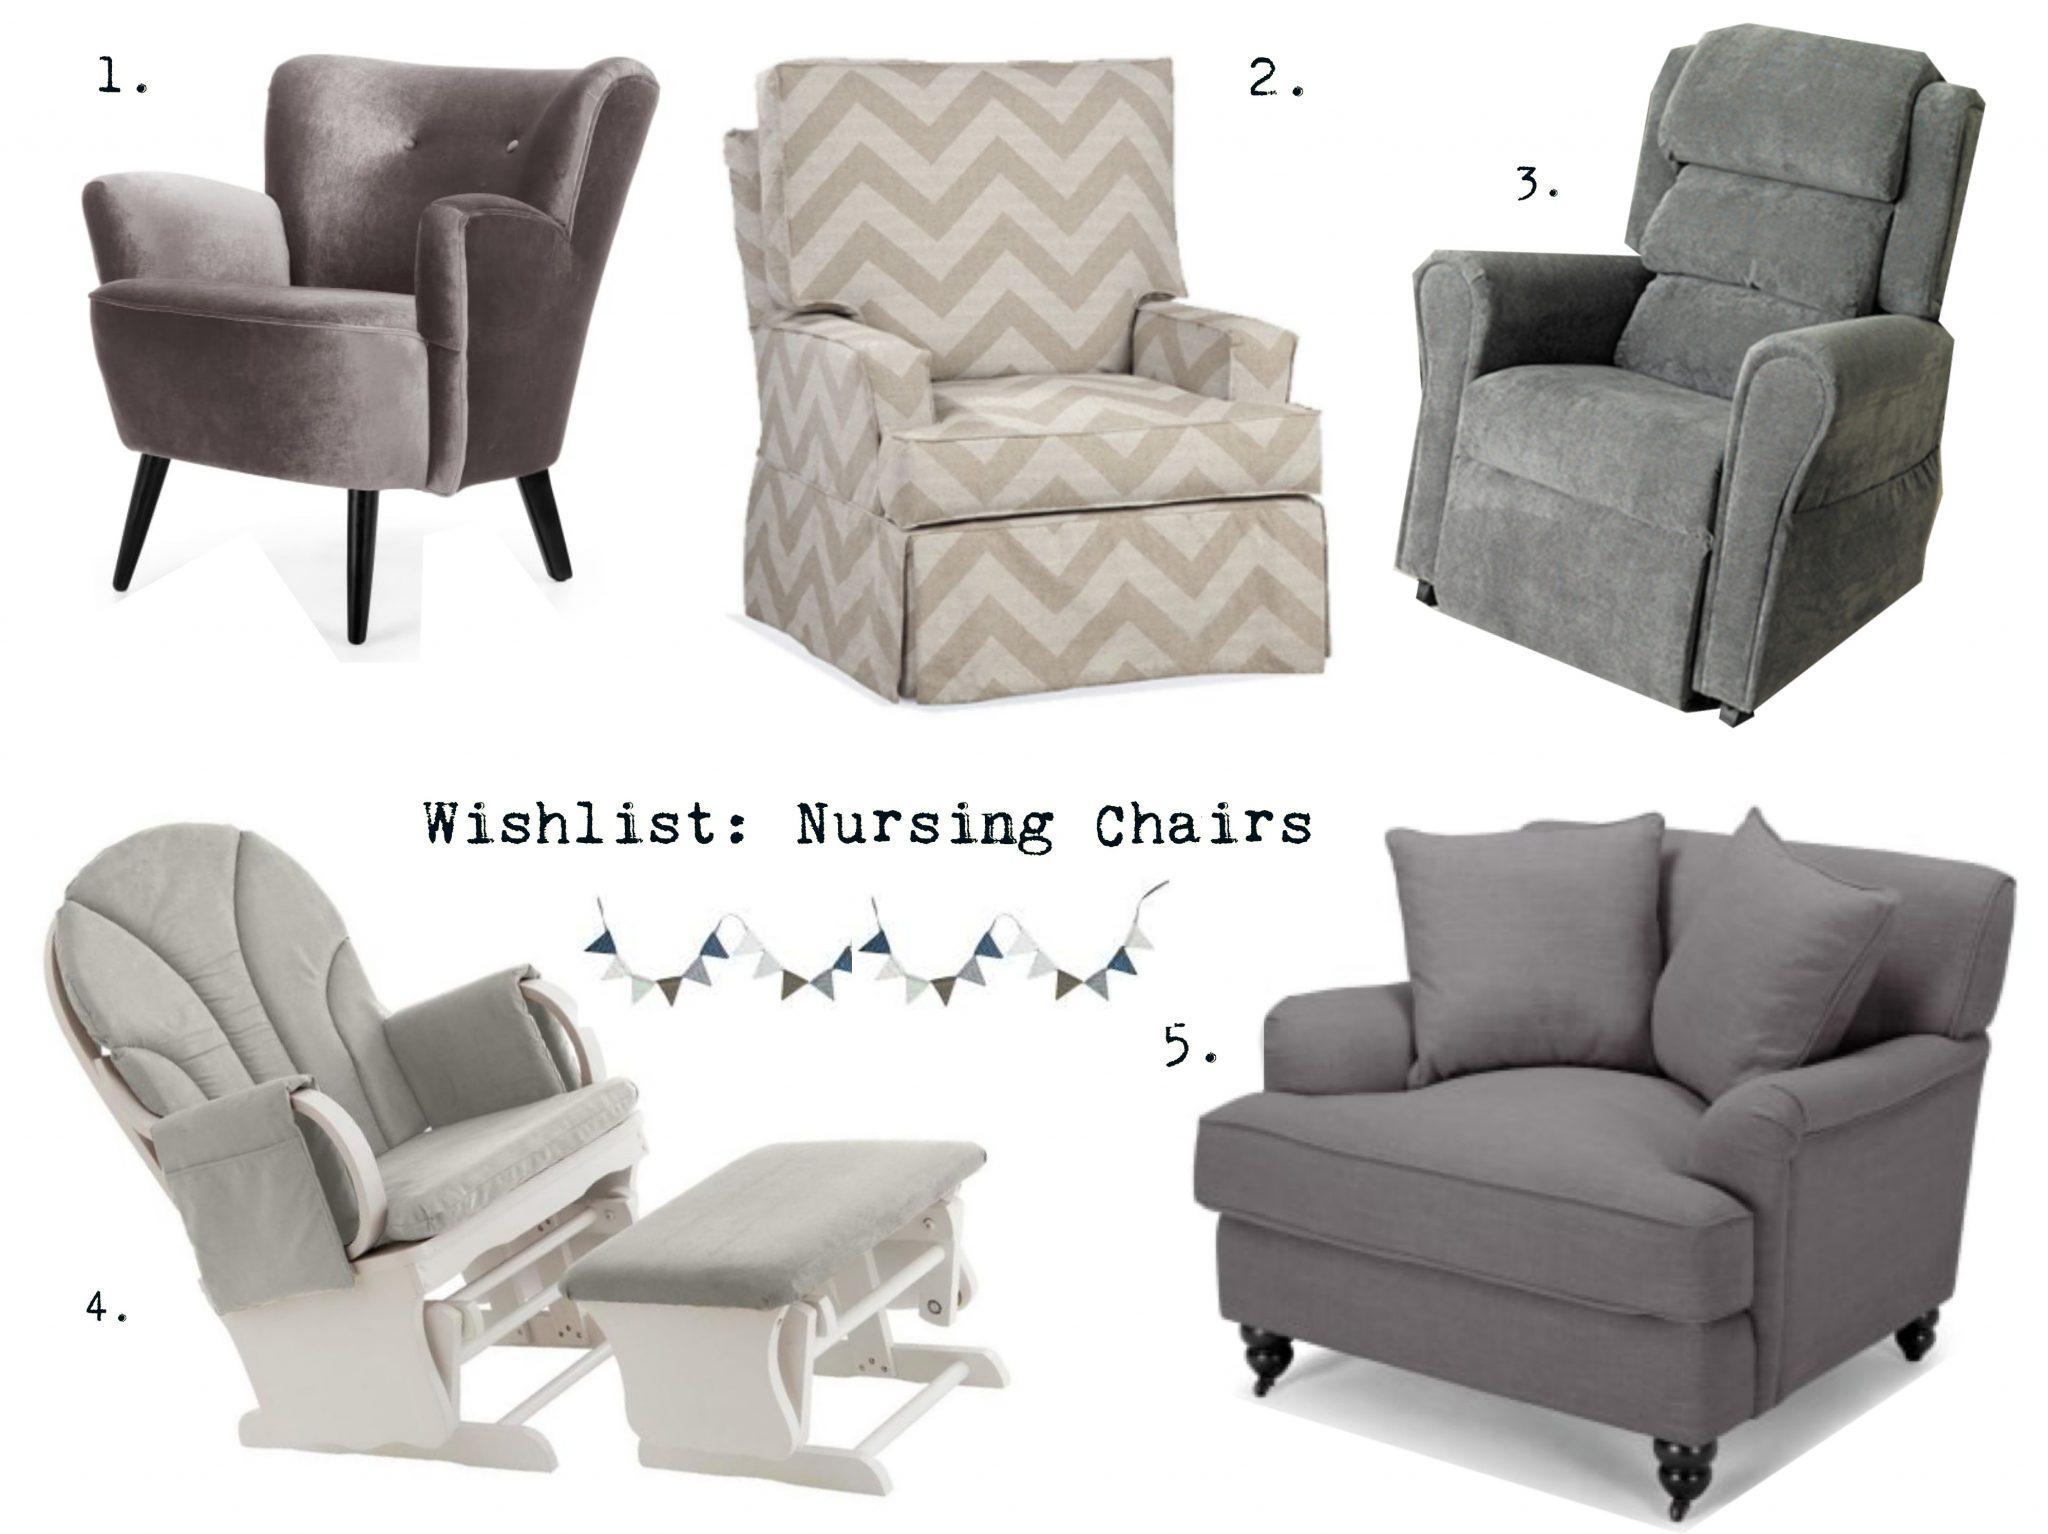 nursing-chairs-wishlist